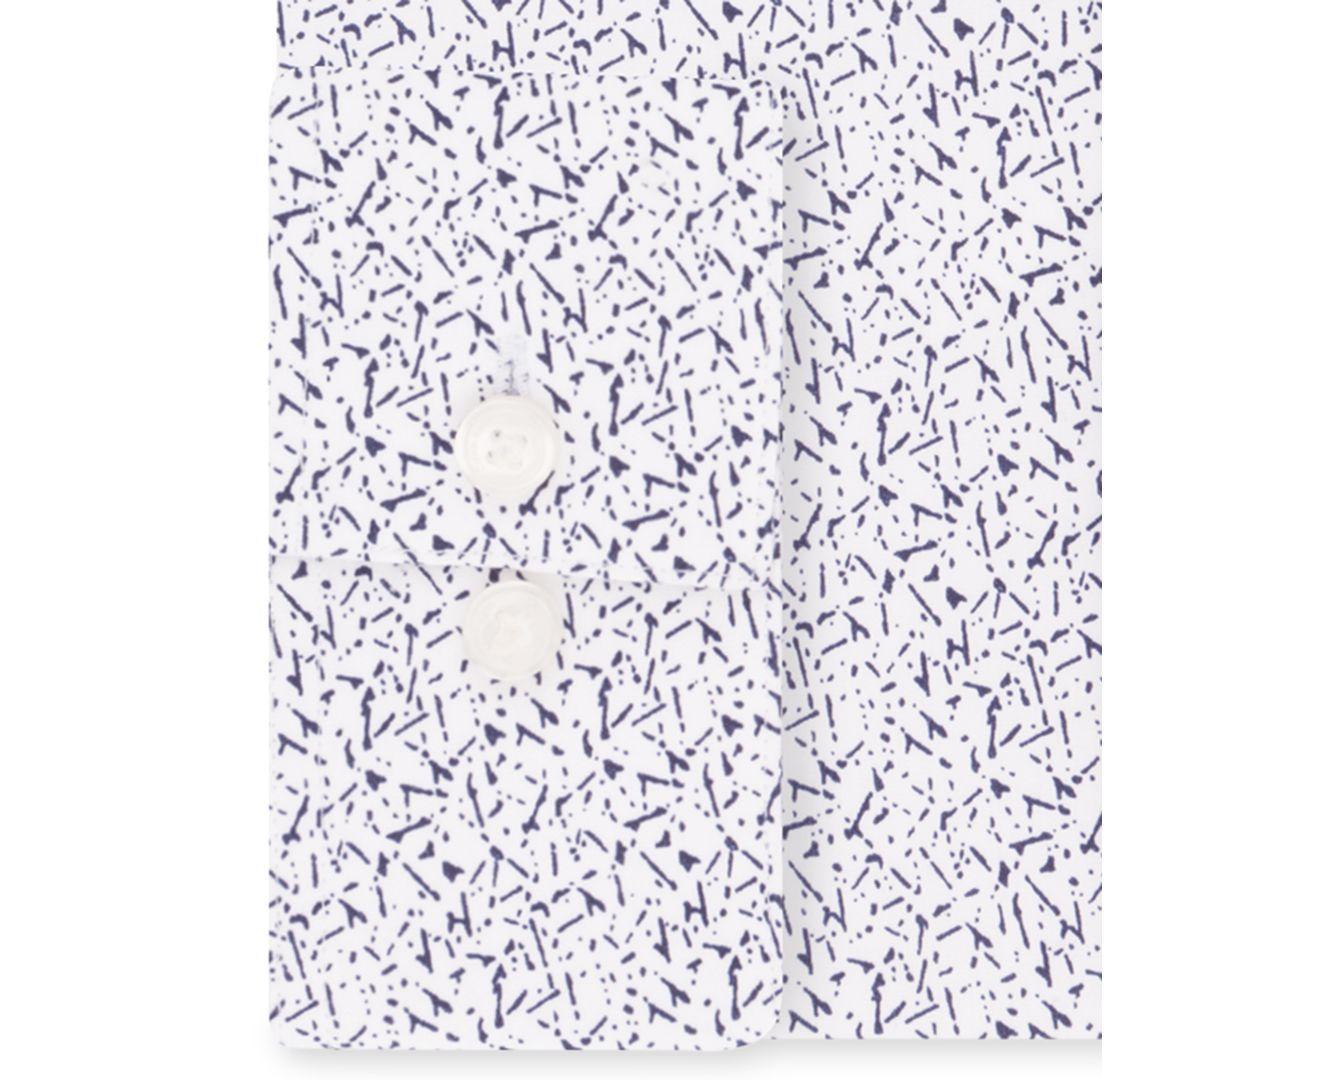 Calvin Klein Mens Dress Shirt White Size 14-14 1/2 Extreme-Slim